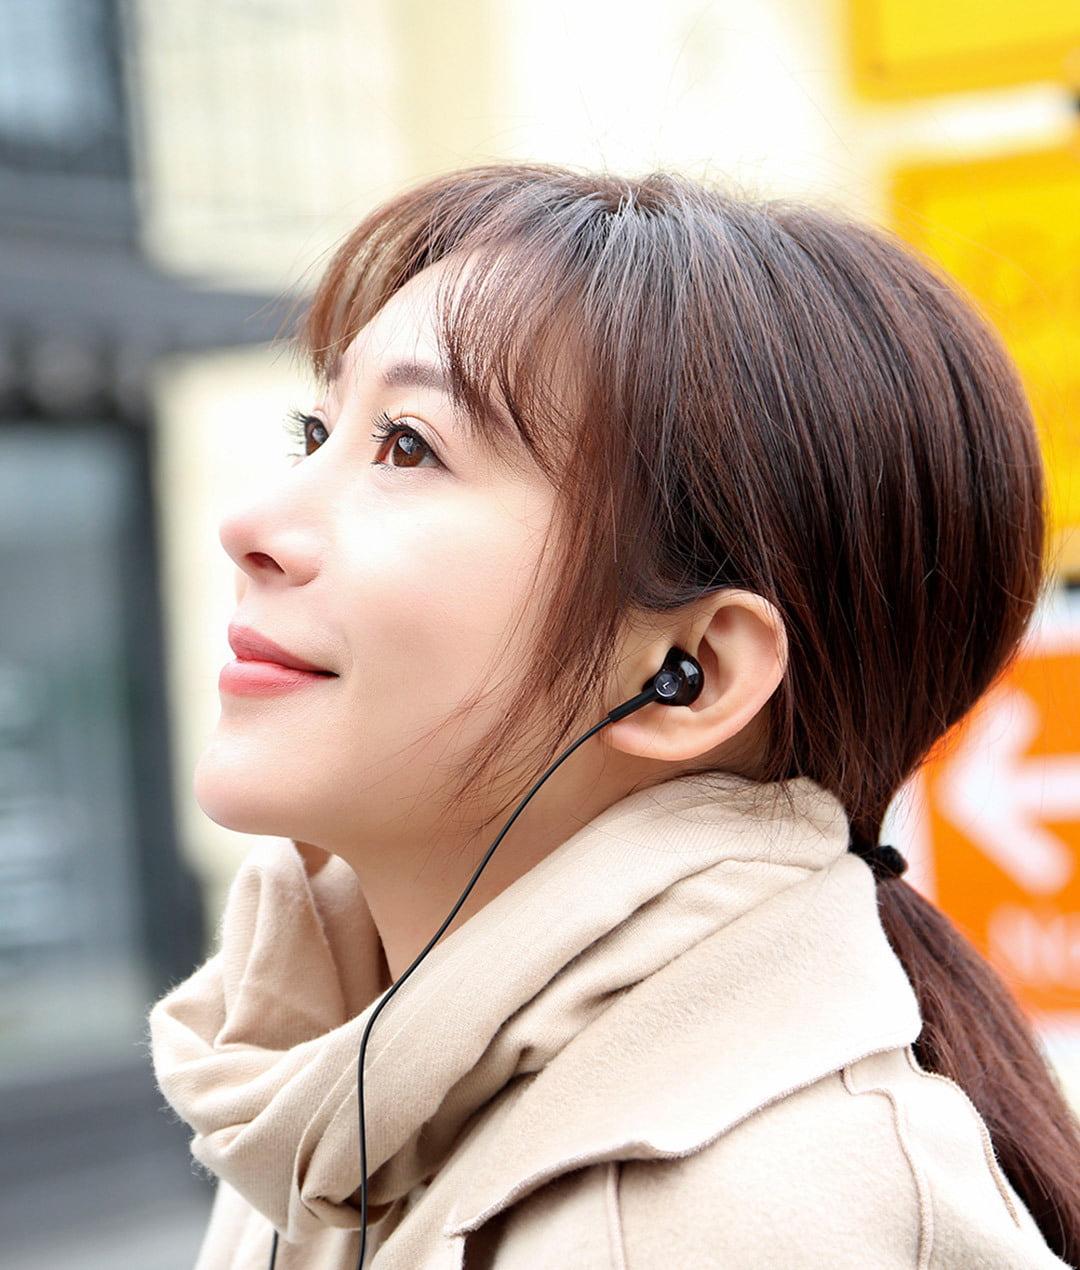 tai nghe gom xiaomi mi dual unit half ear 605c44c527c1c